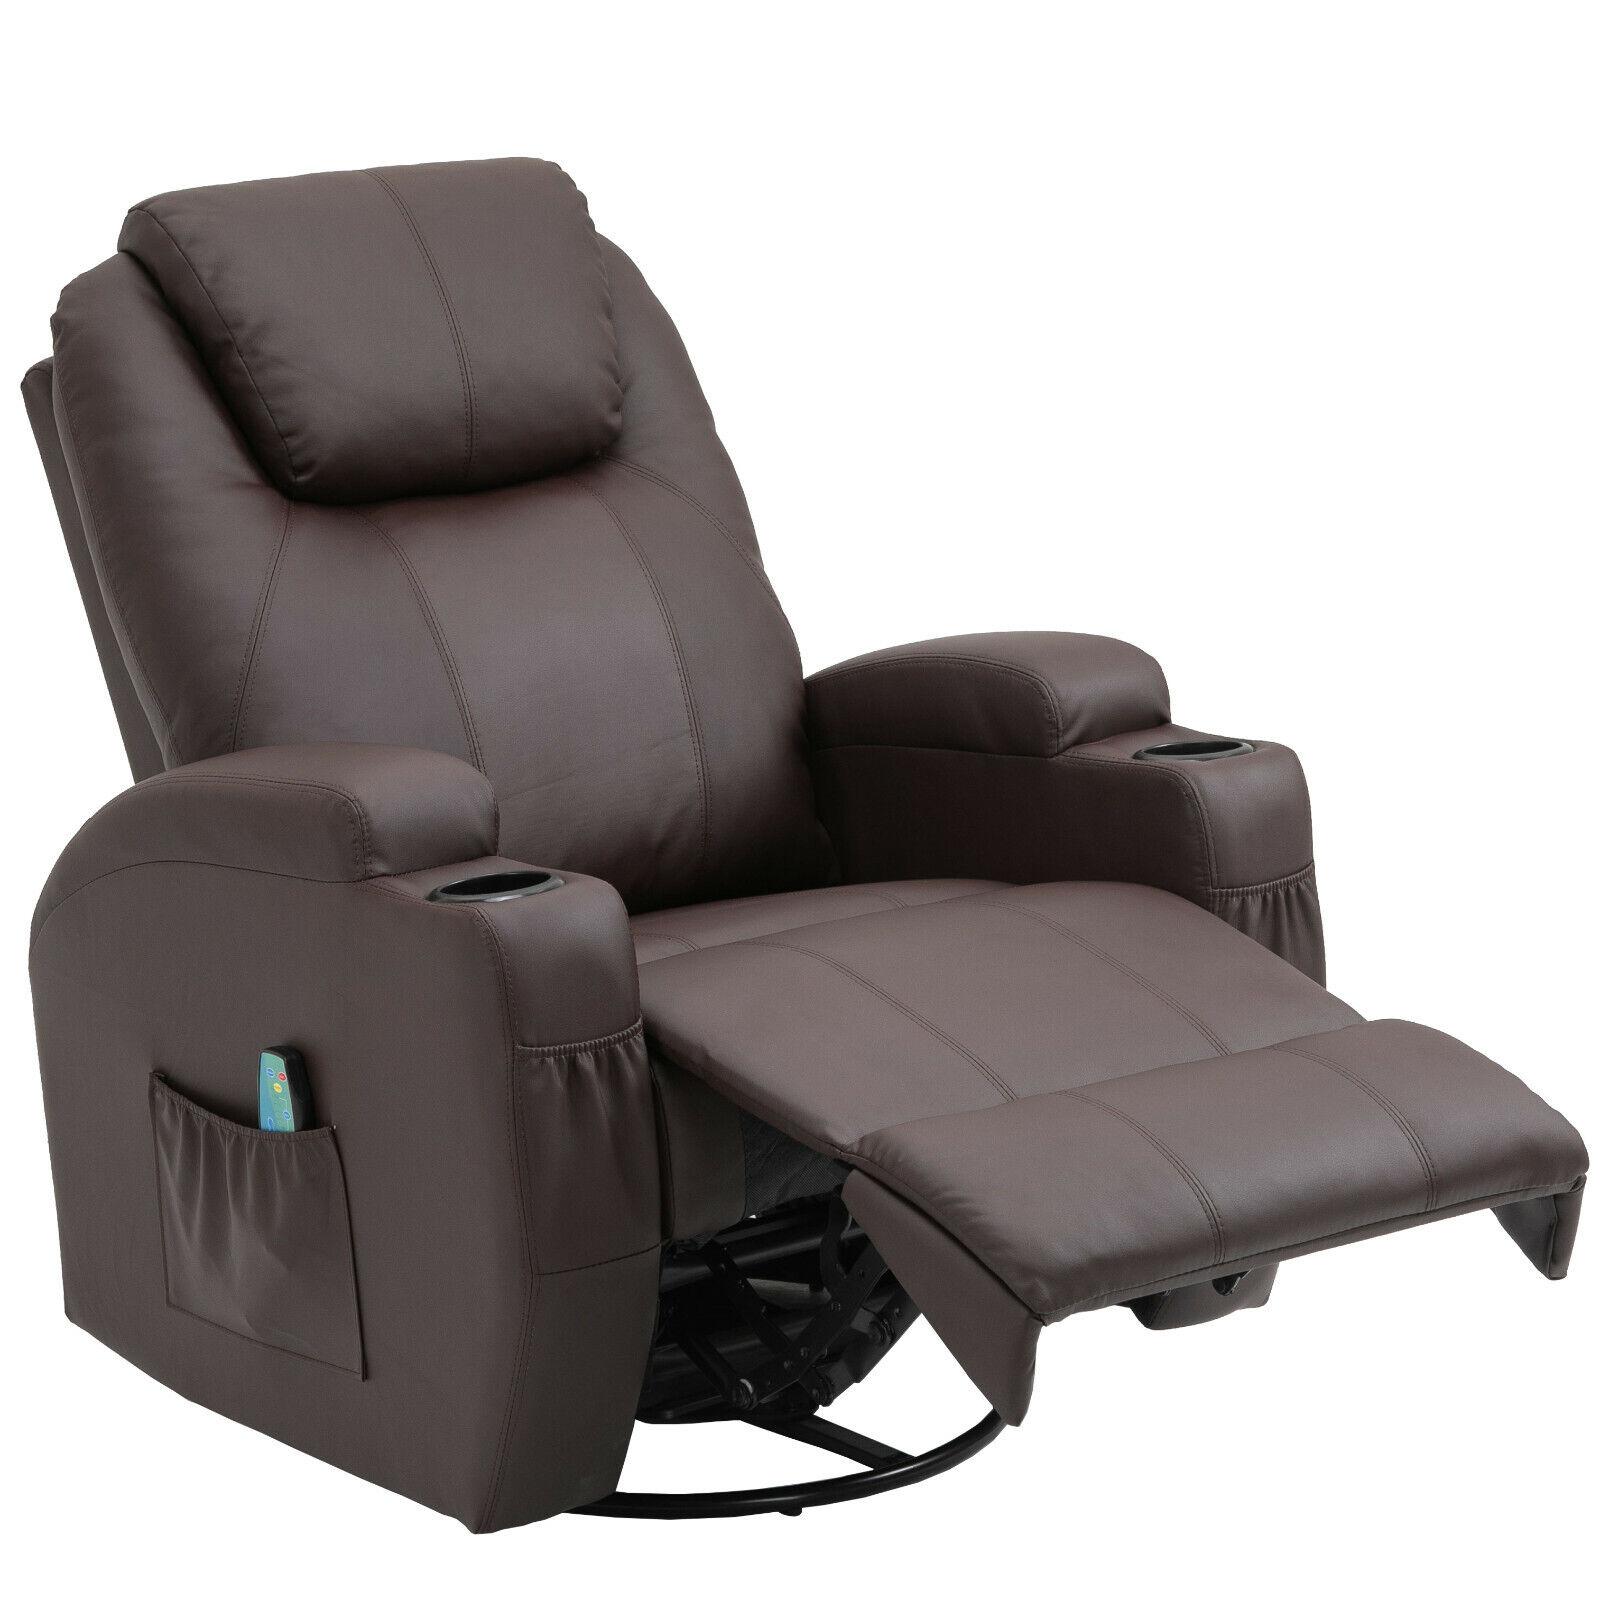 Relaxsessel Fernsehsessel Massagesessel TV Sessel Polstersesse 360°Wärmefunktion